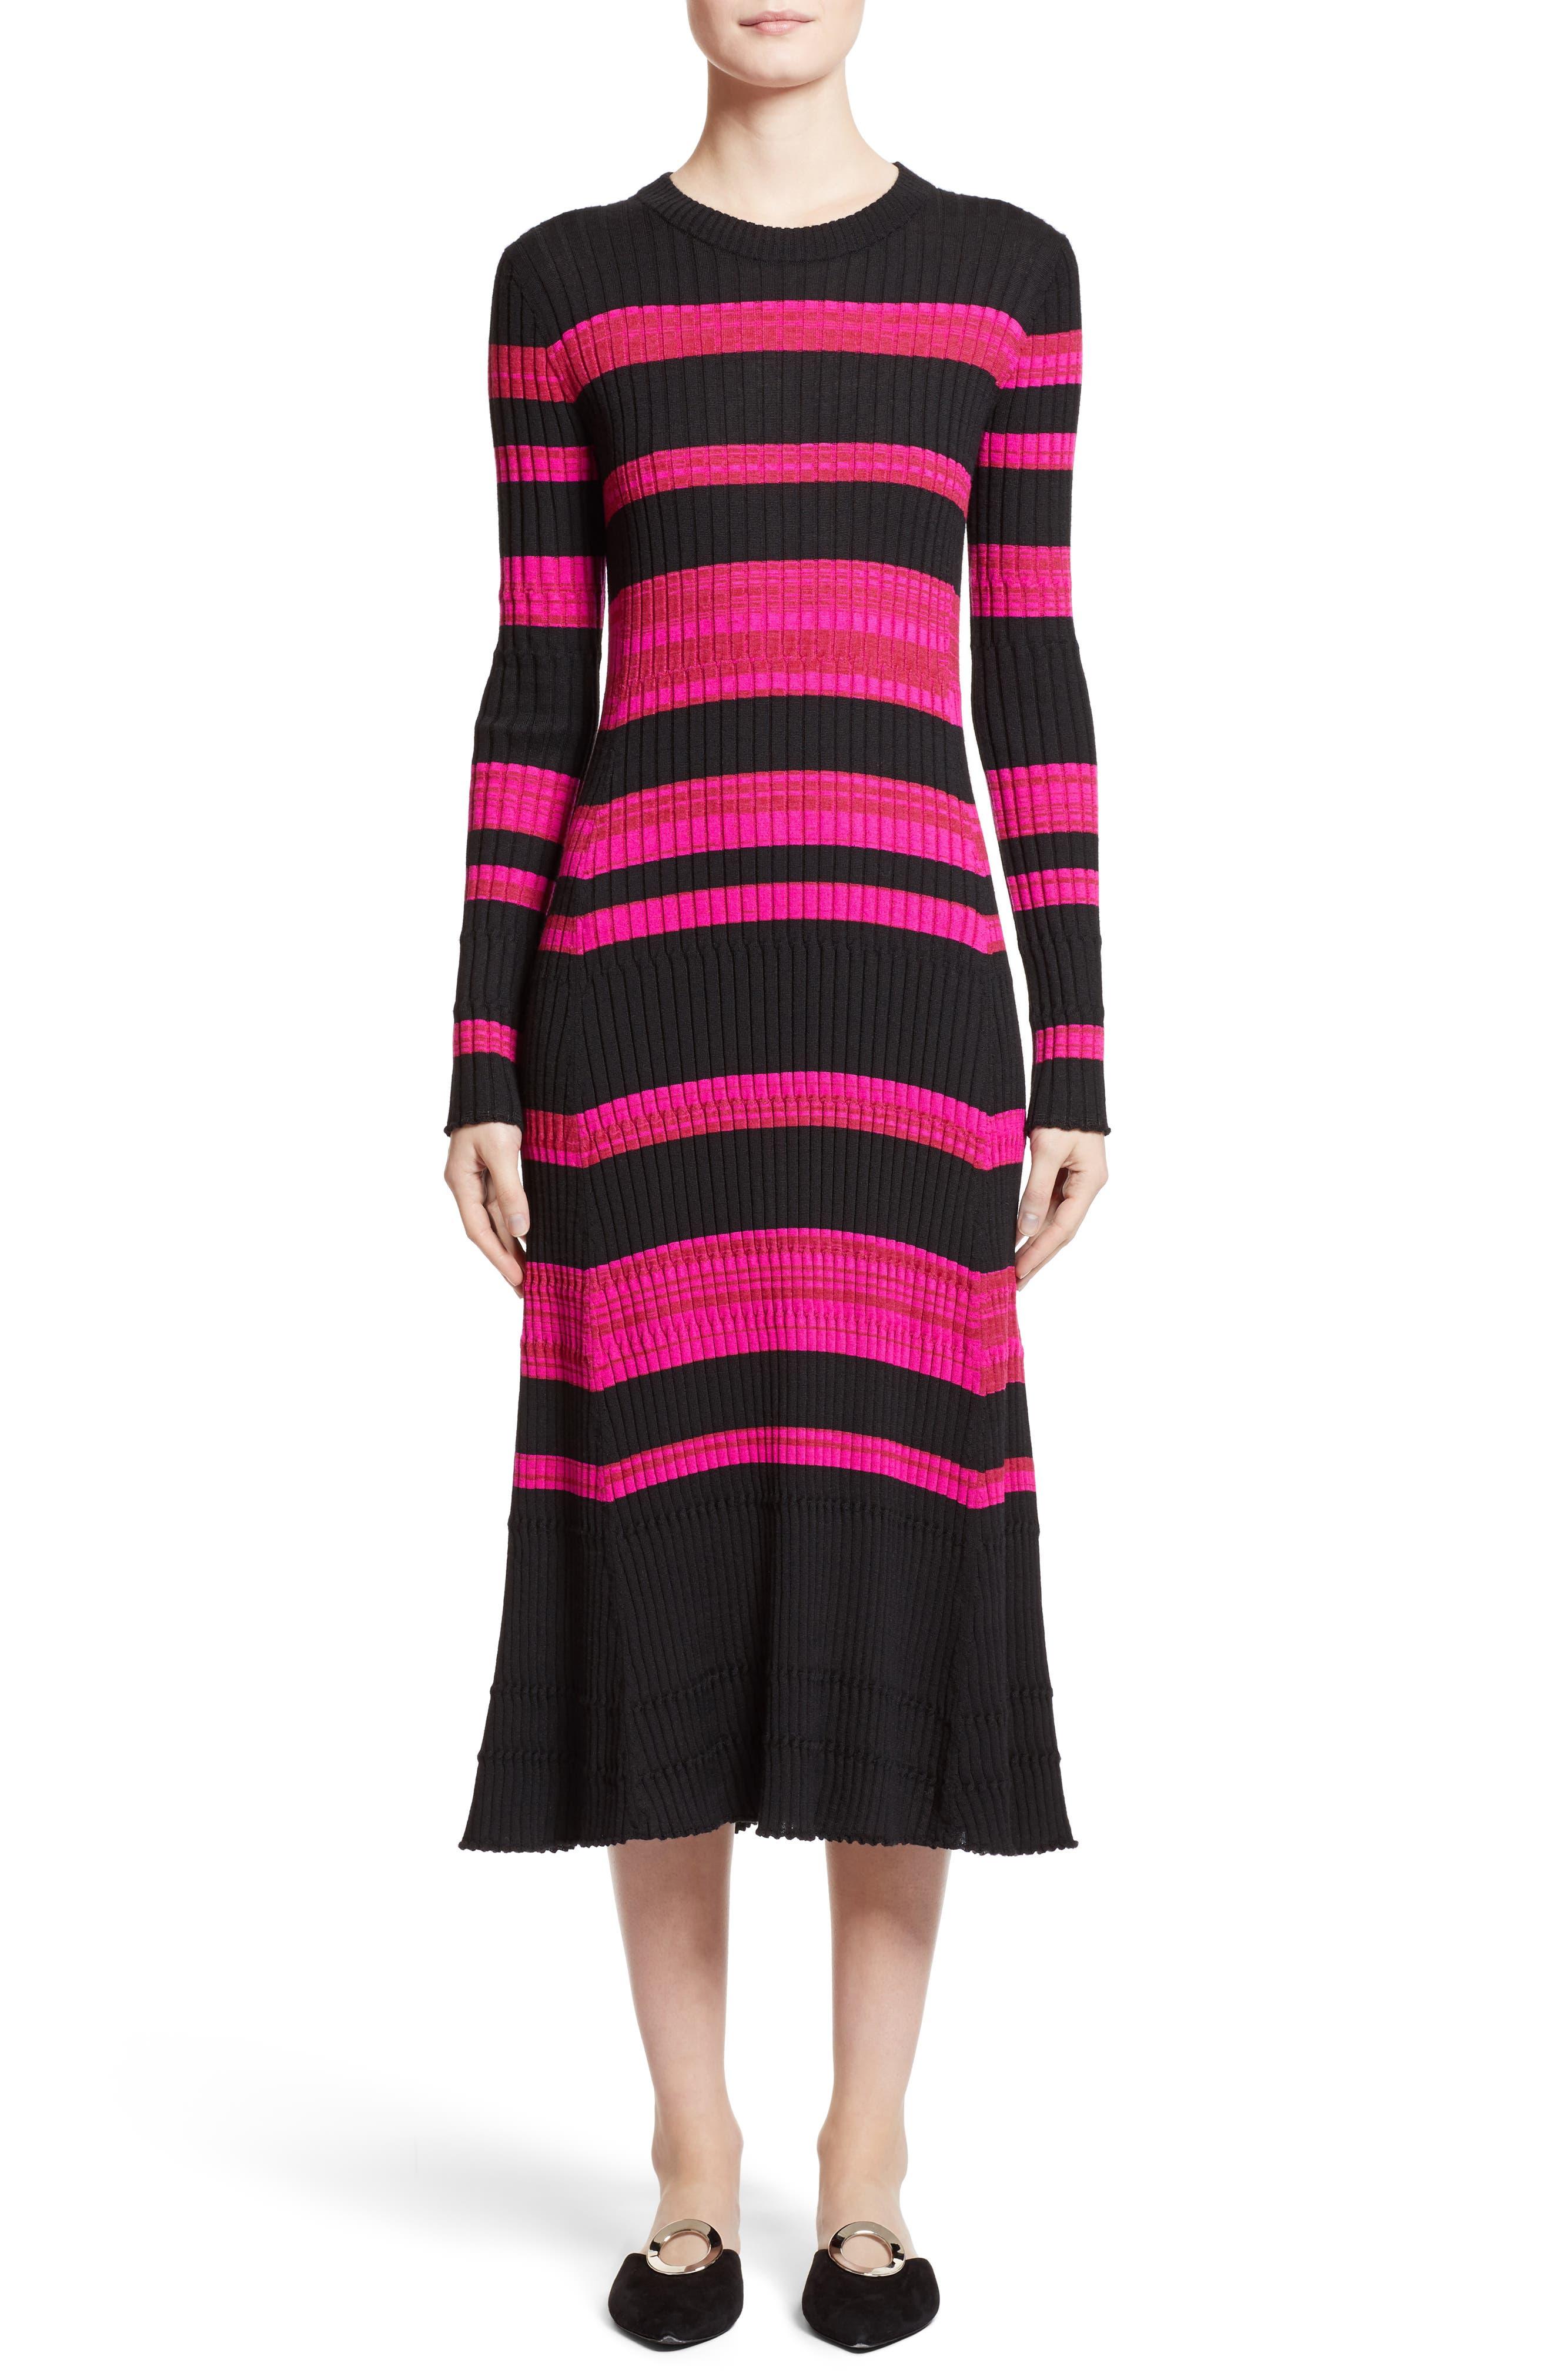 Stripe Cashmere, Wool & Silk Midi Dress,                         Main,                         color, Black/ Electric Pink Multi